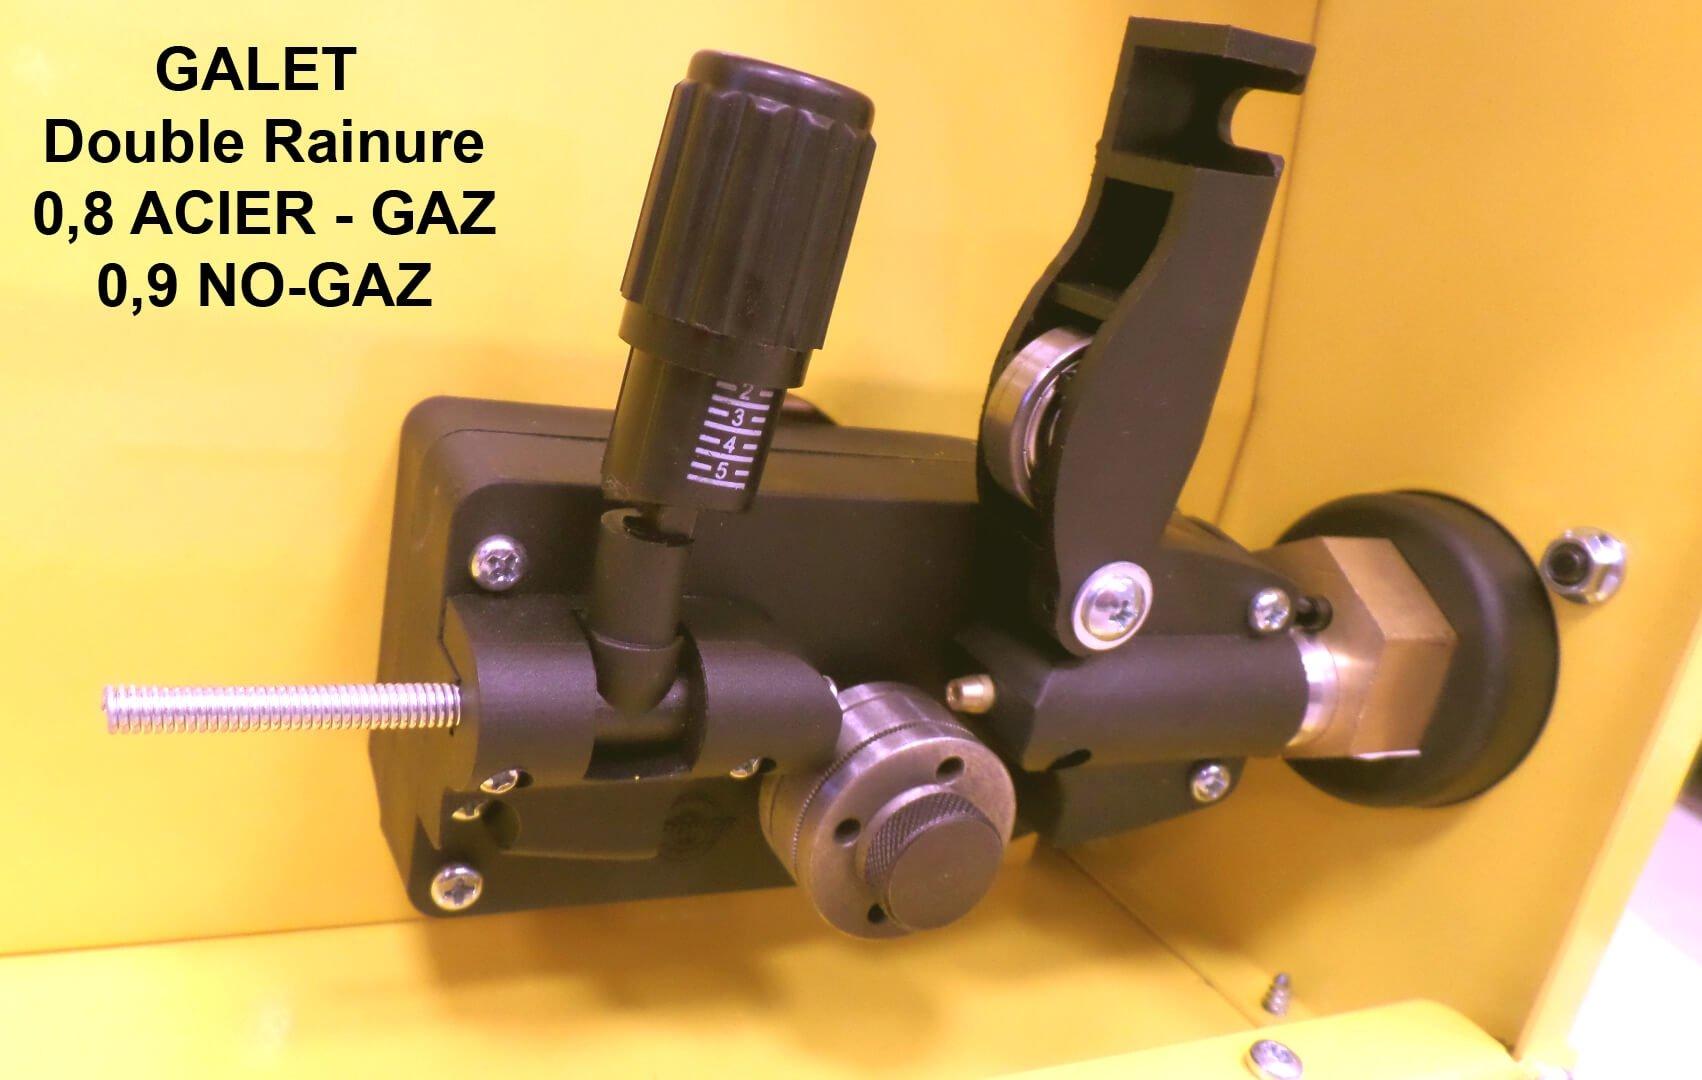 Poste de soudure MIG EASYMIG 150 -140A 230V - 3 EN1 - GYS cace39193c43